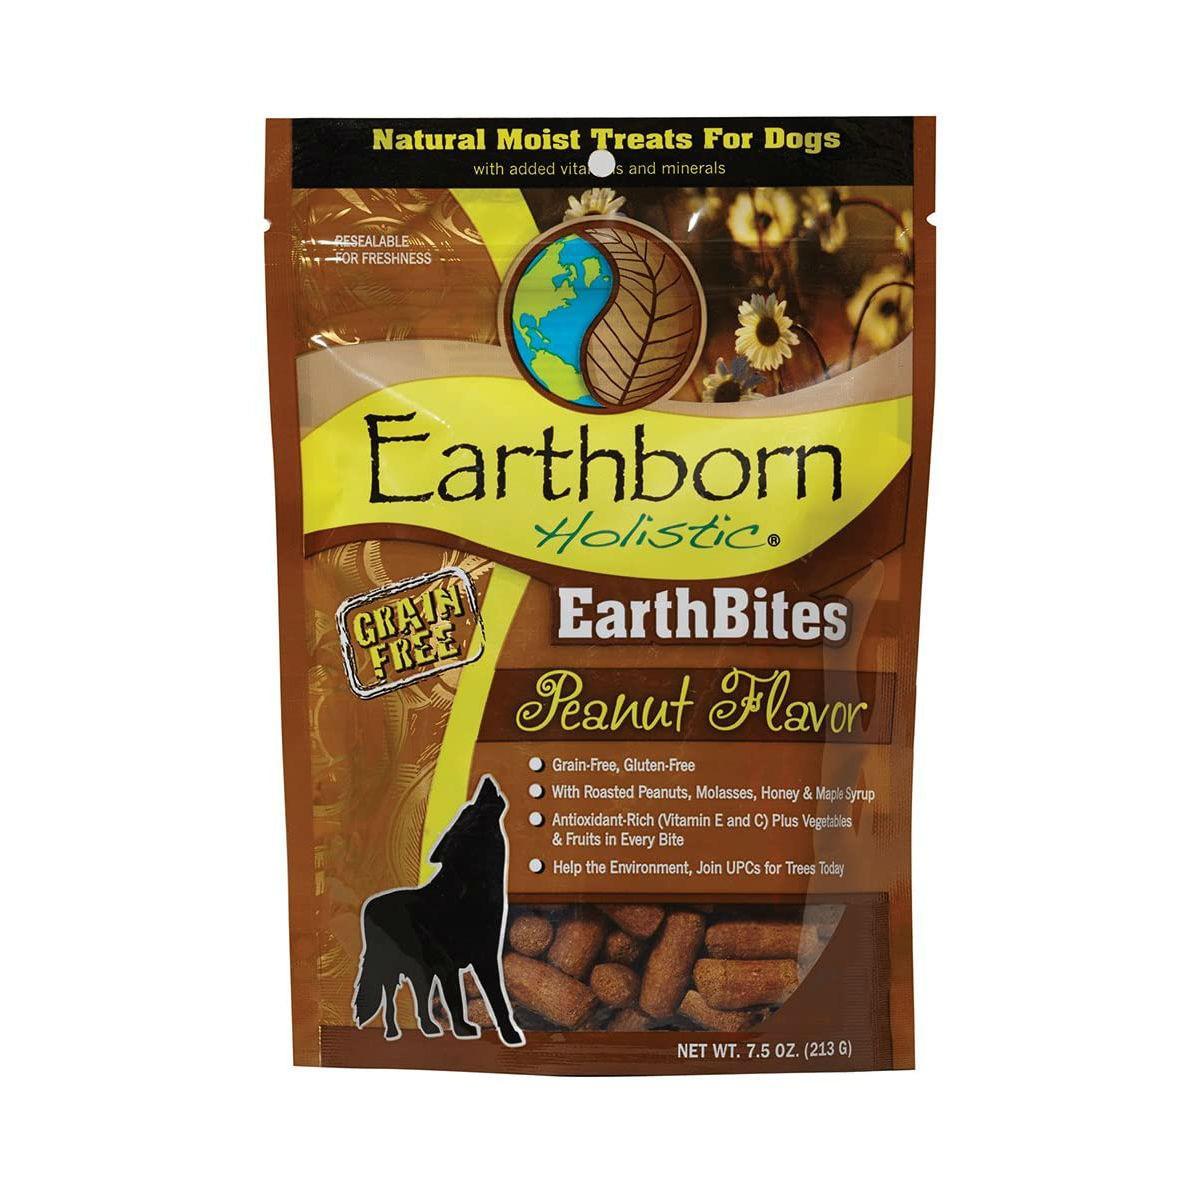 Earthborn Holistic Grain-Free EarthBites Moist Dog Treats - Peanut